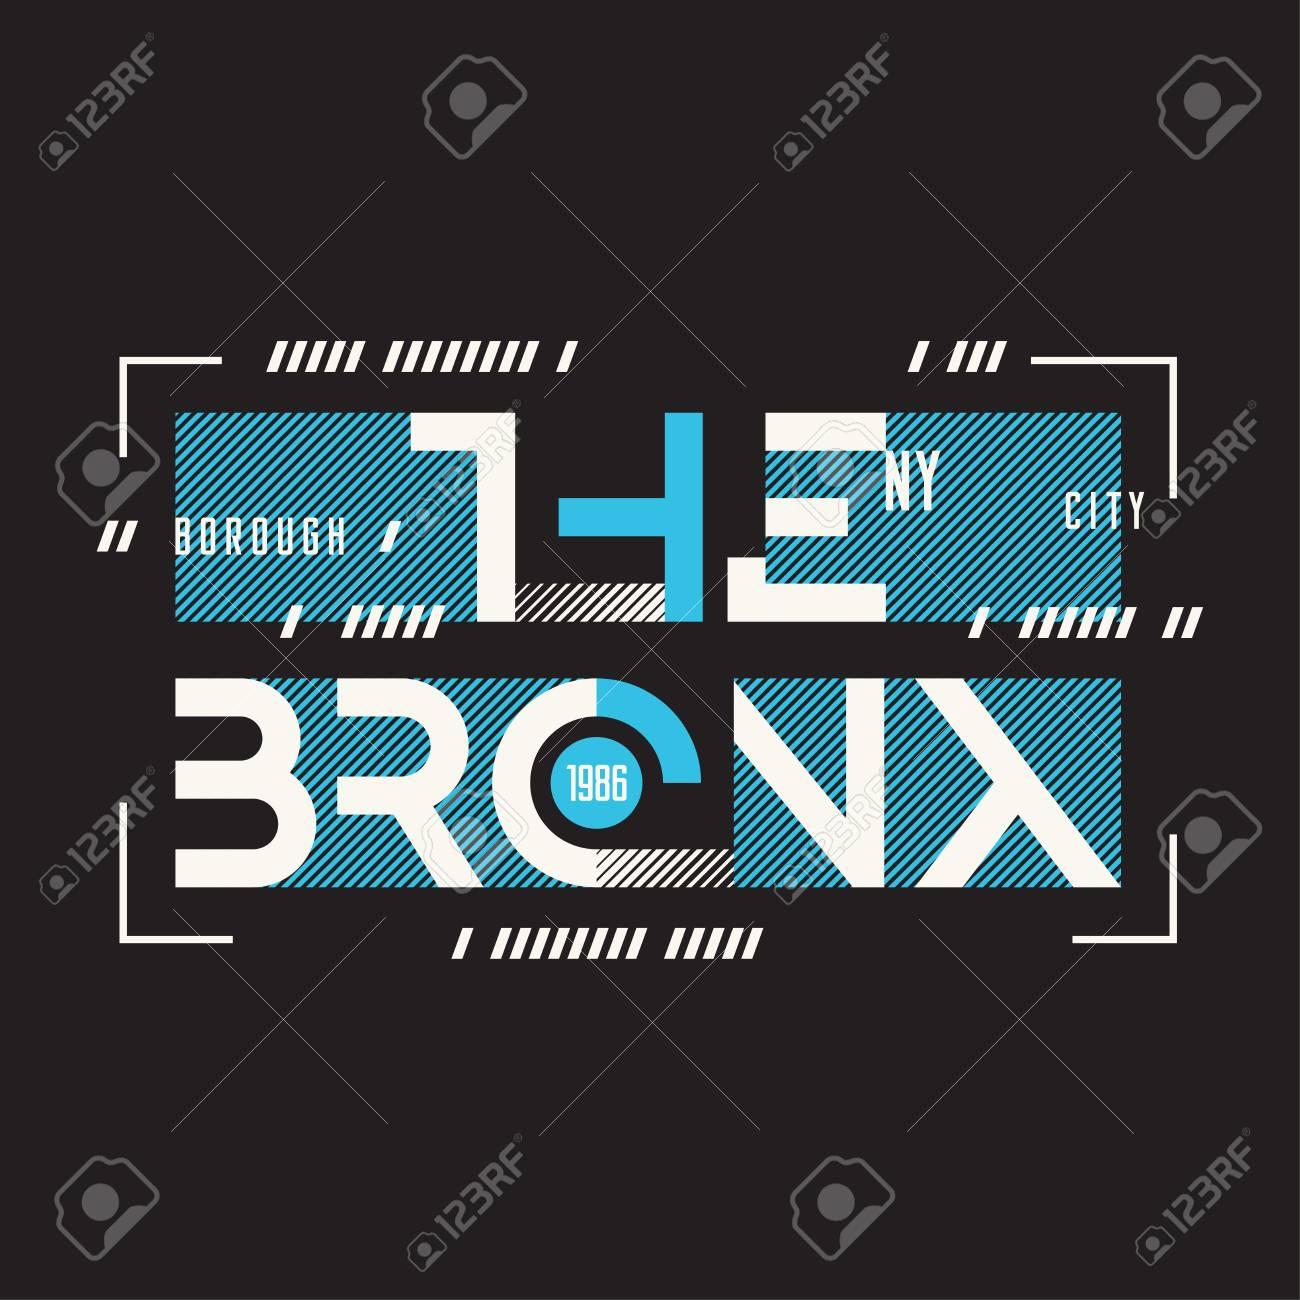 The Bronx New York vector t-shirt and apparel geometric design, - 97043625